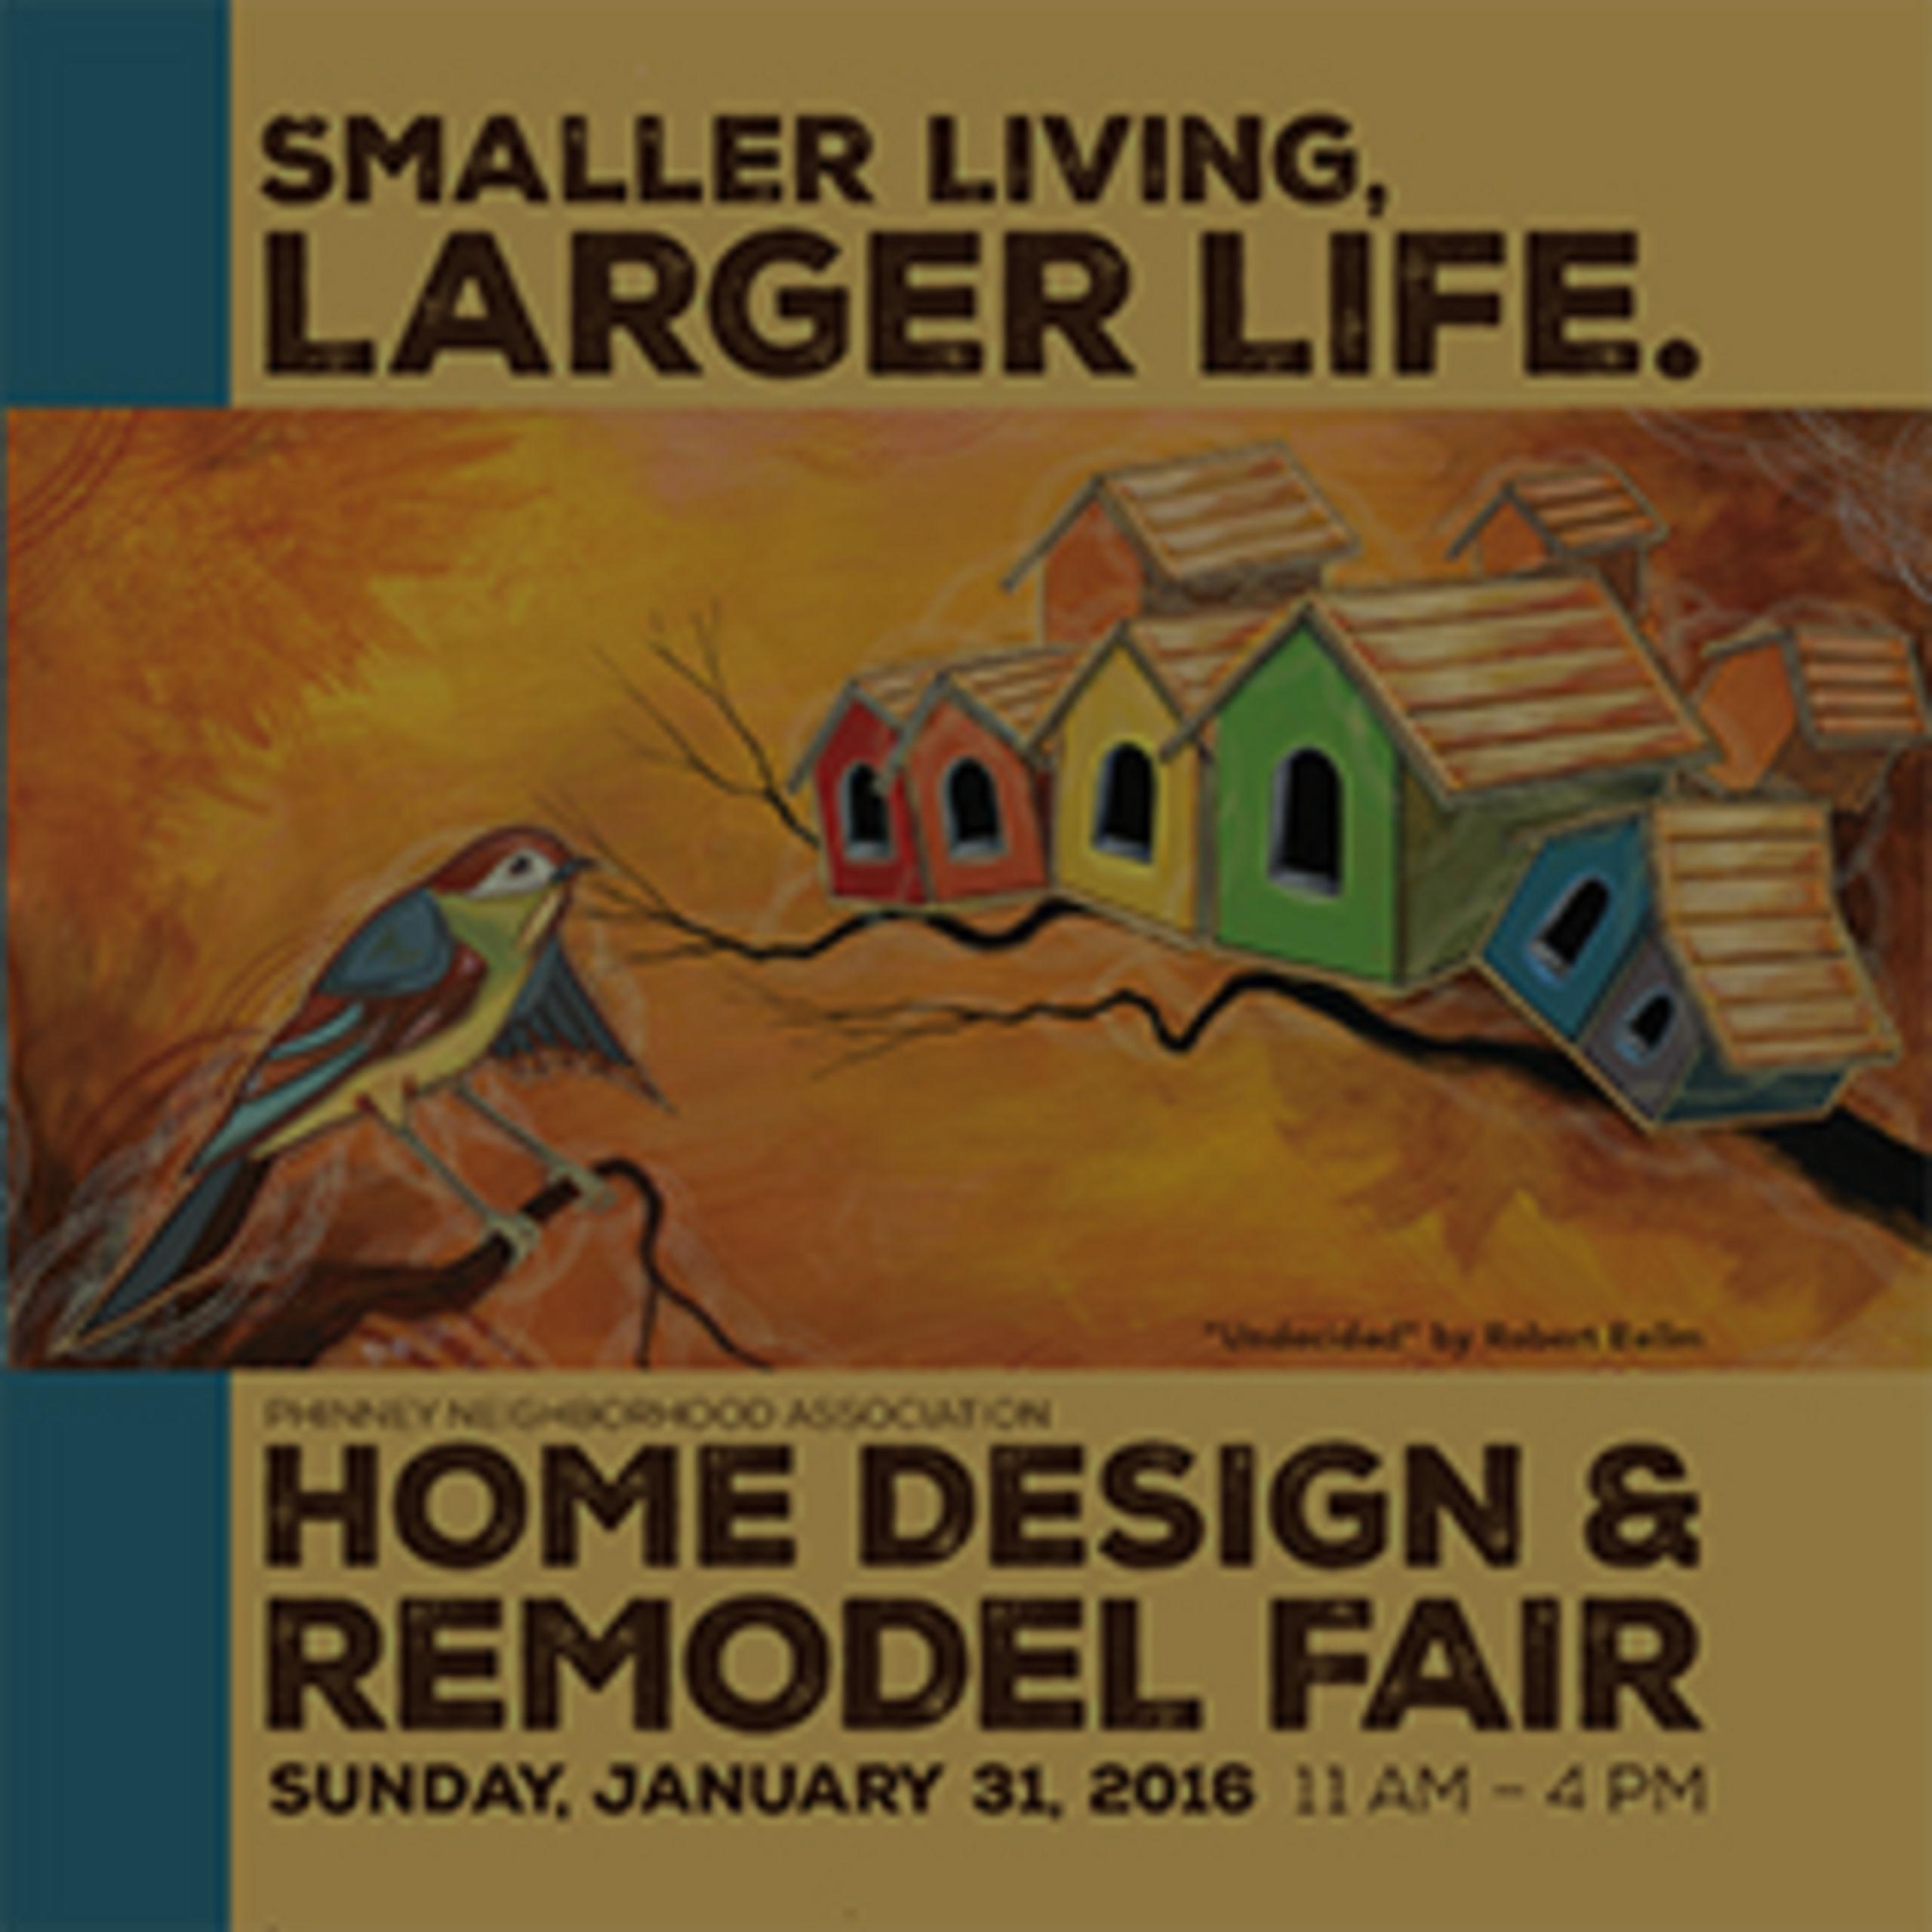 PNA Home Design and Remodel Fair